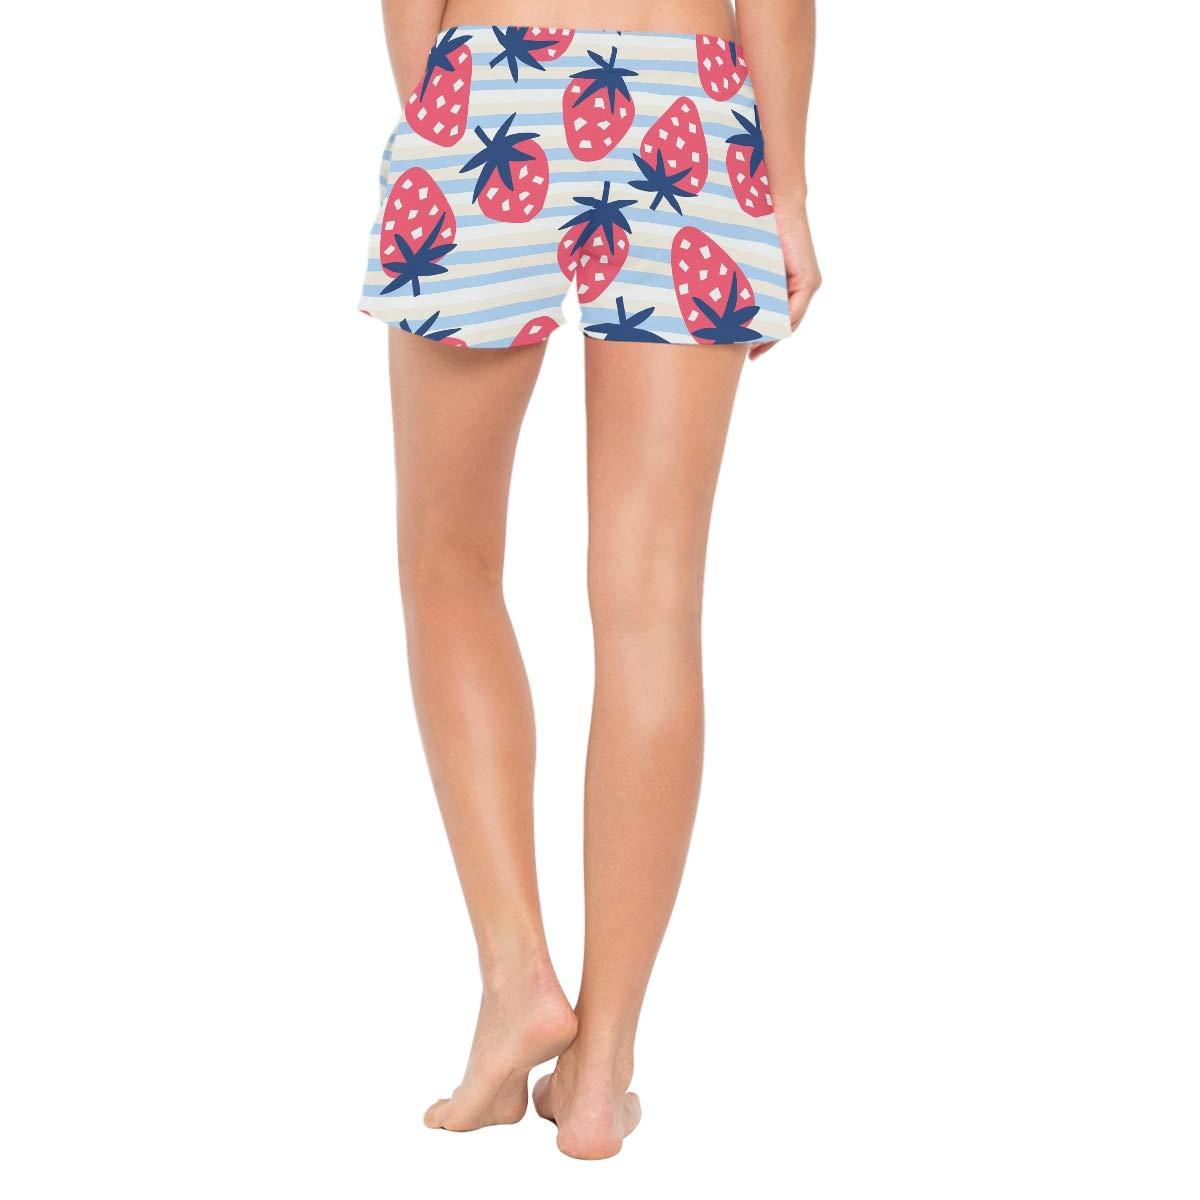 CENHOME Women Swim Trunks Pink Strawberry Blue White Striped Beach Board Shorts